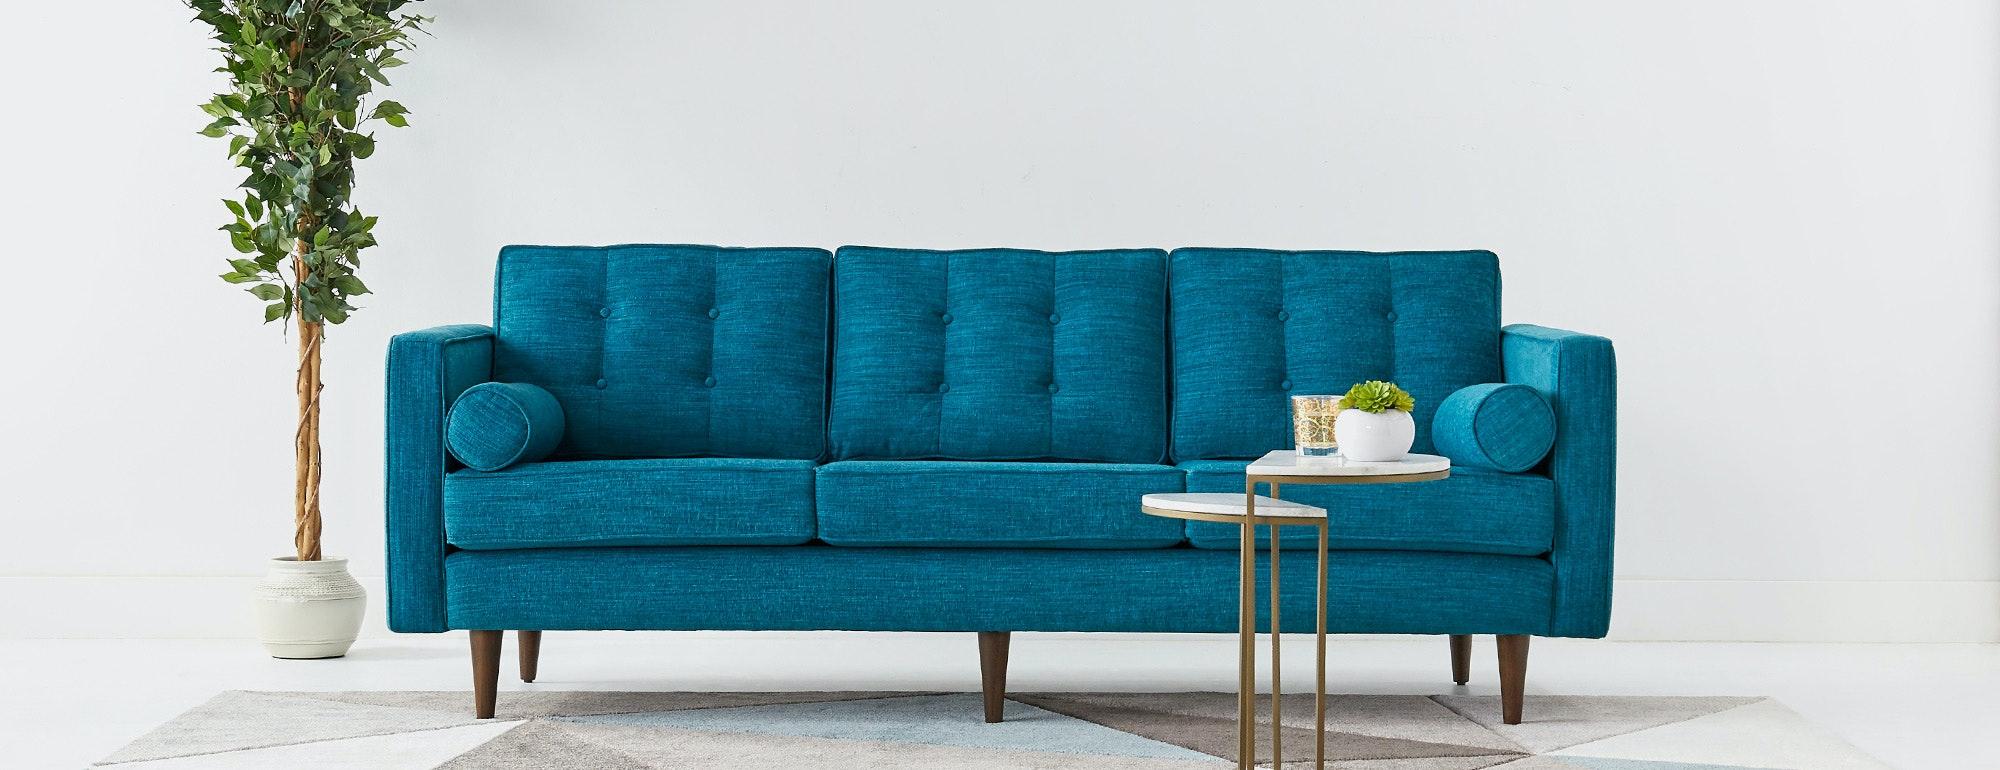 thomasville reclining sofa can u steam clean leather aqua cindy crawford home marcella spa blue ...